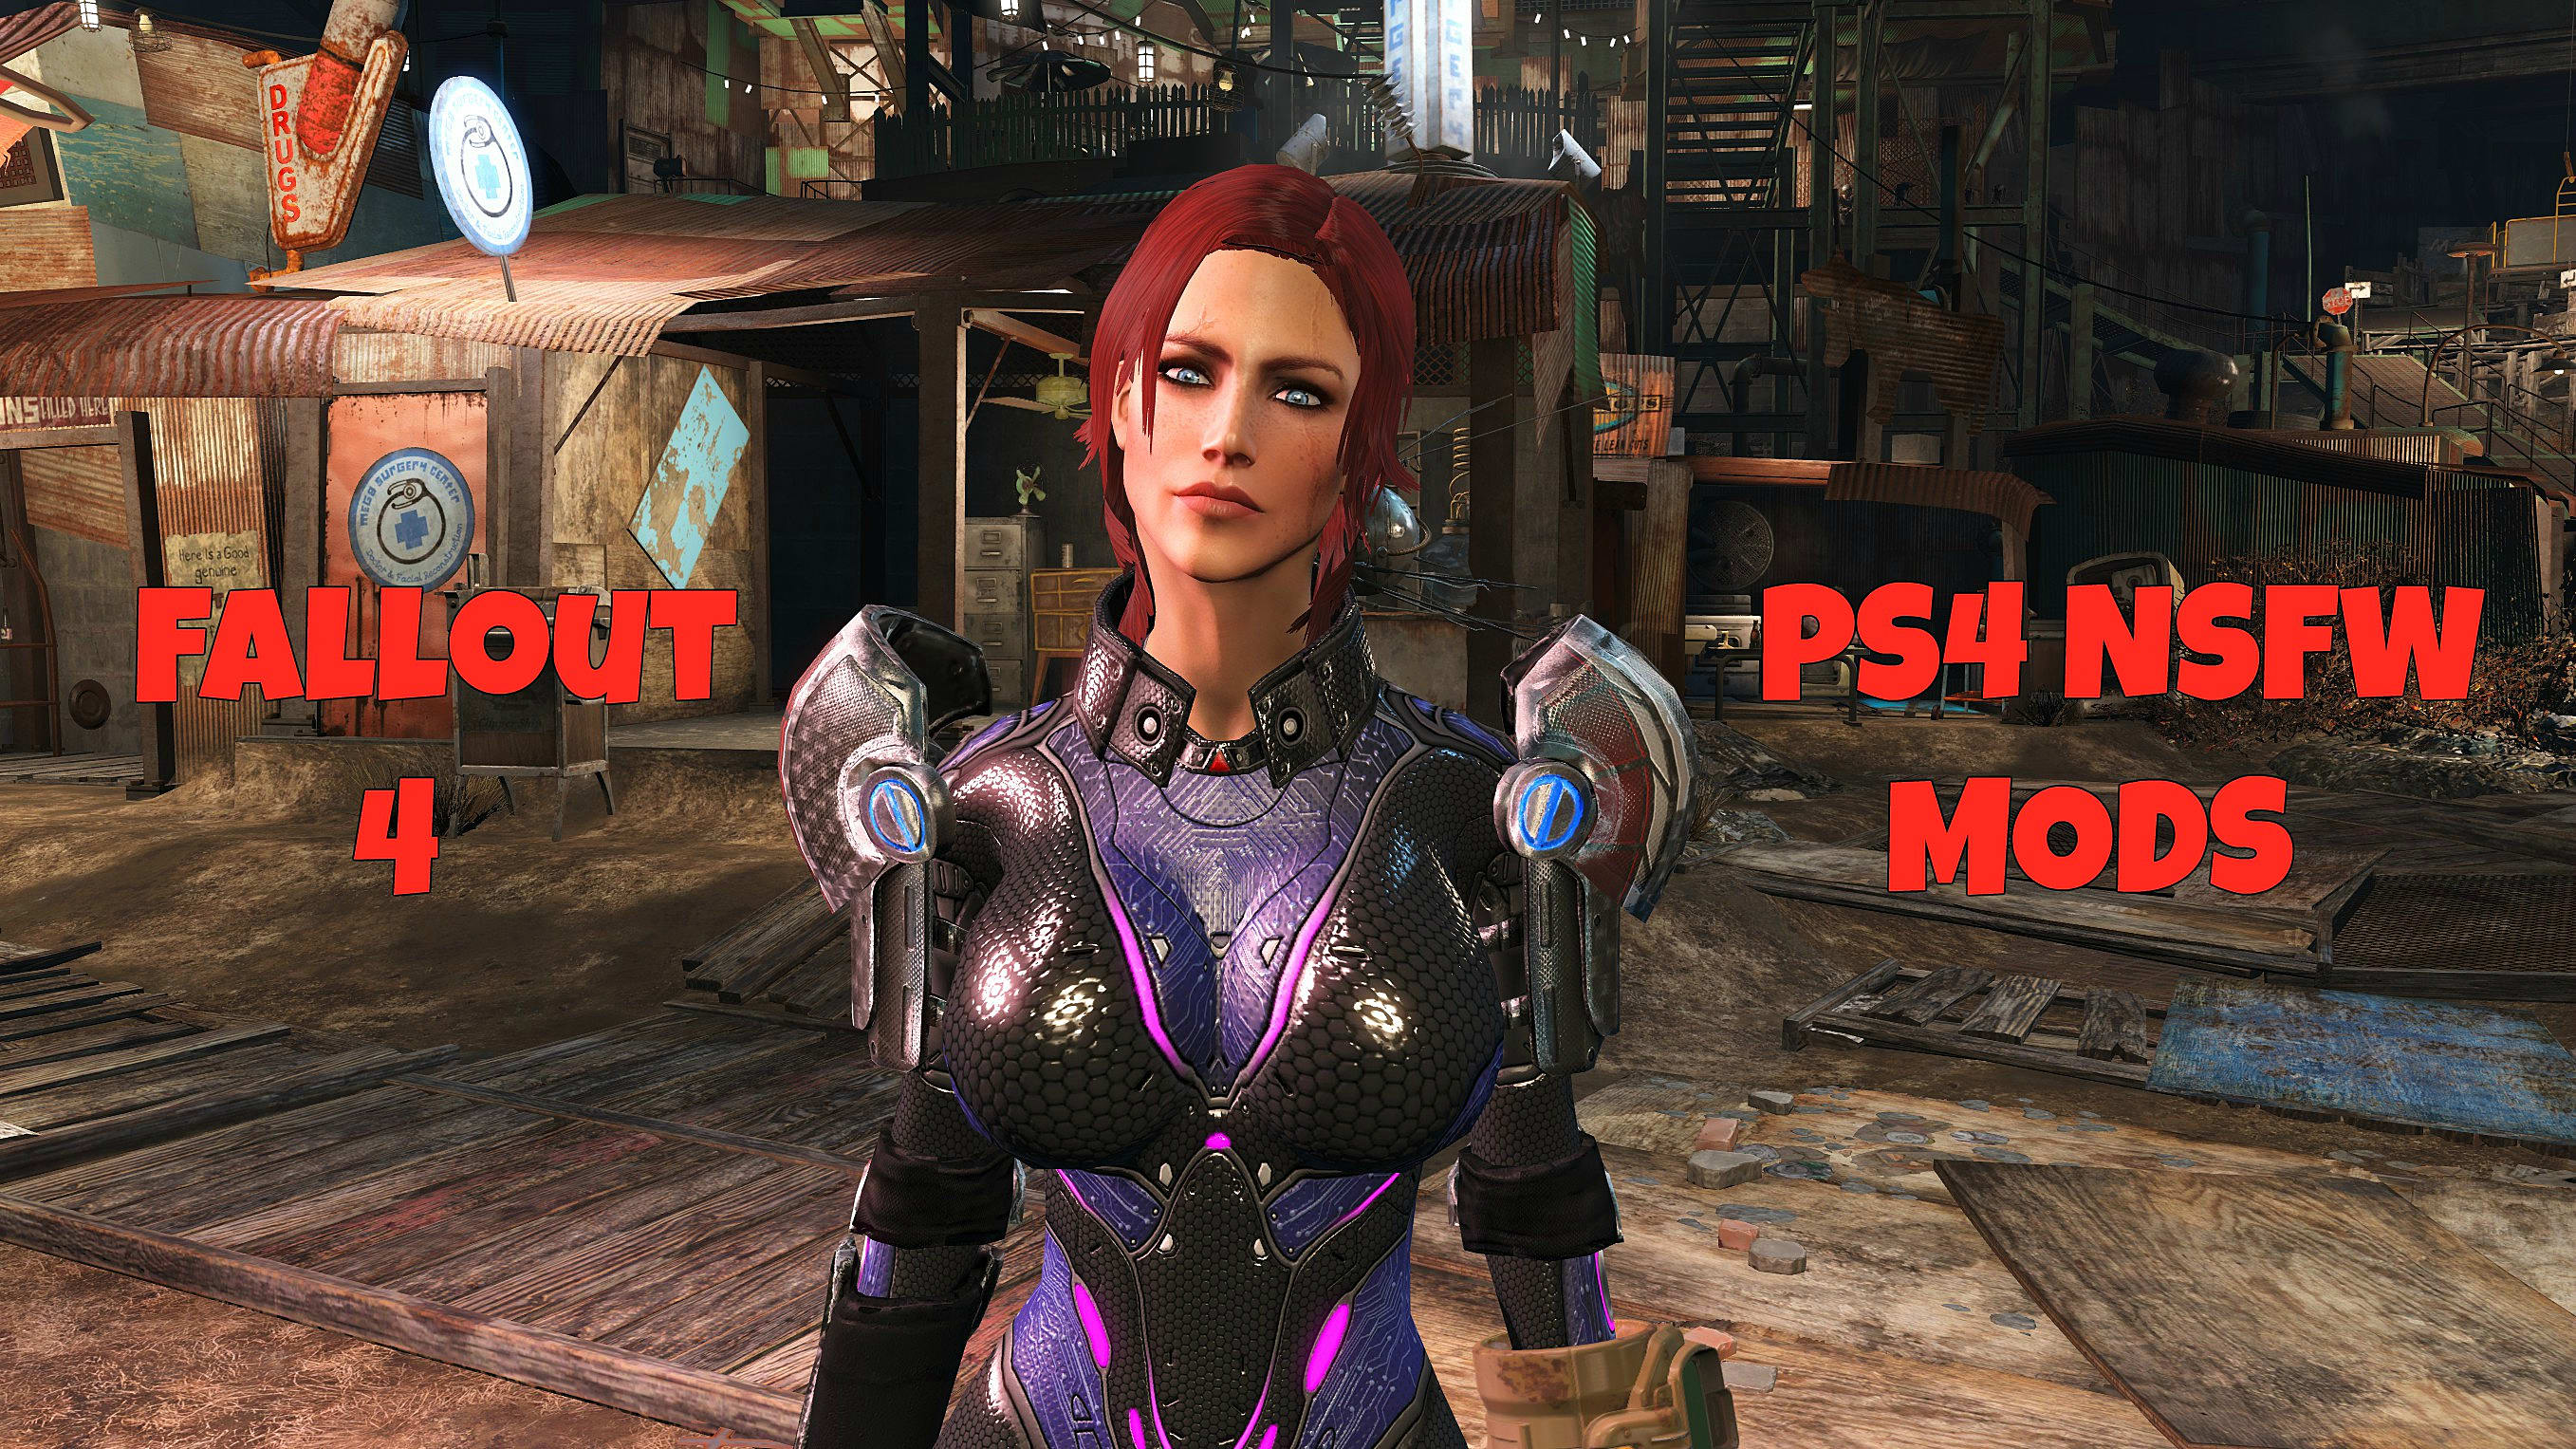 Fallout 3 mature mods